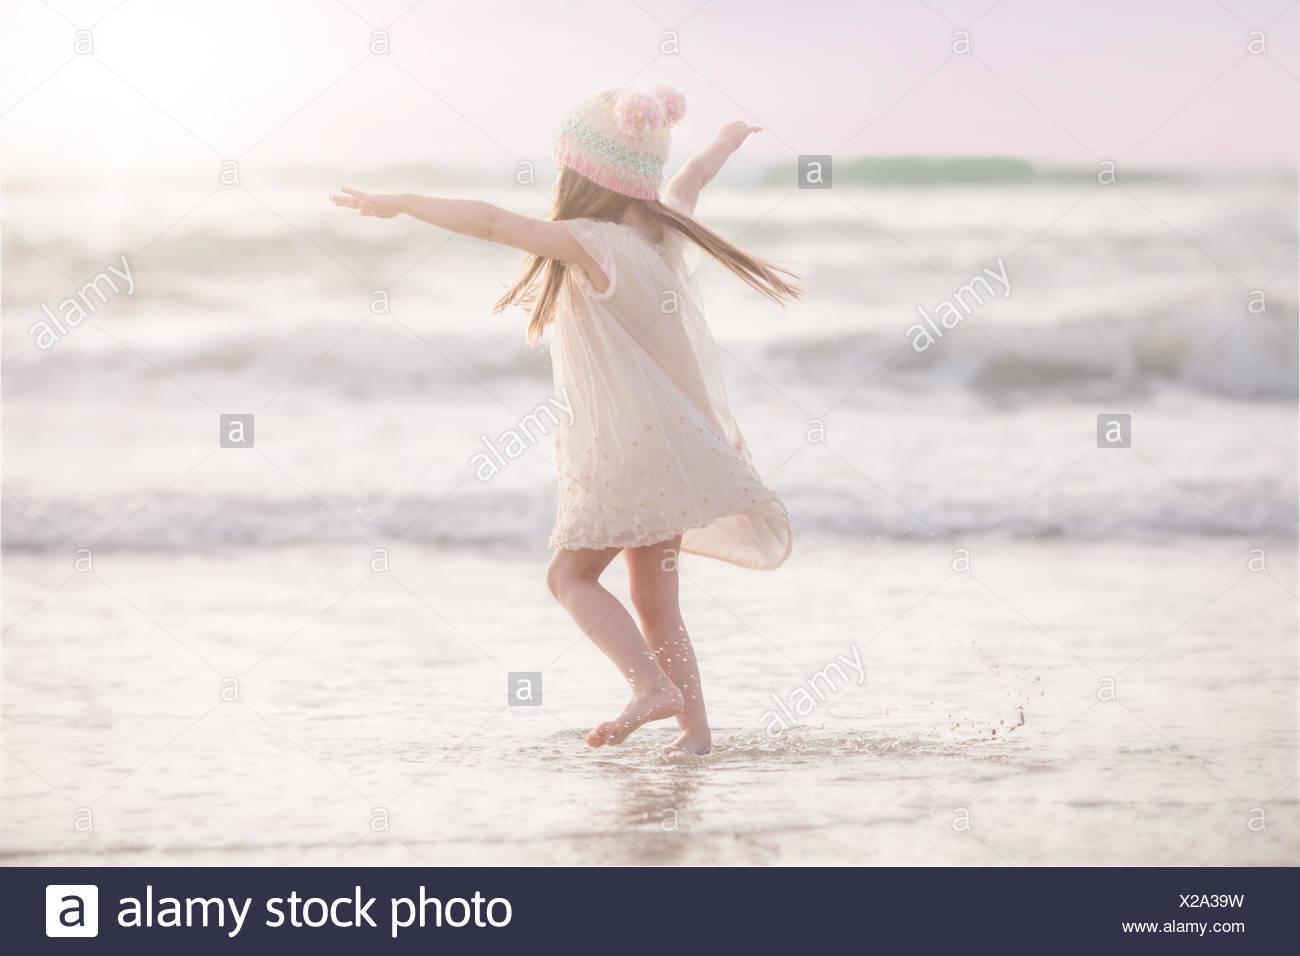 Girl Dancing on the beach Photo Stock